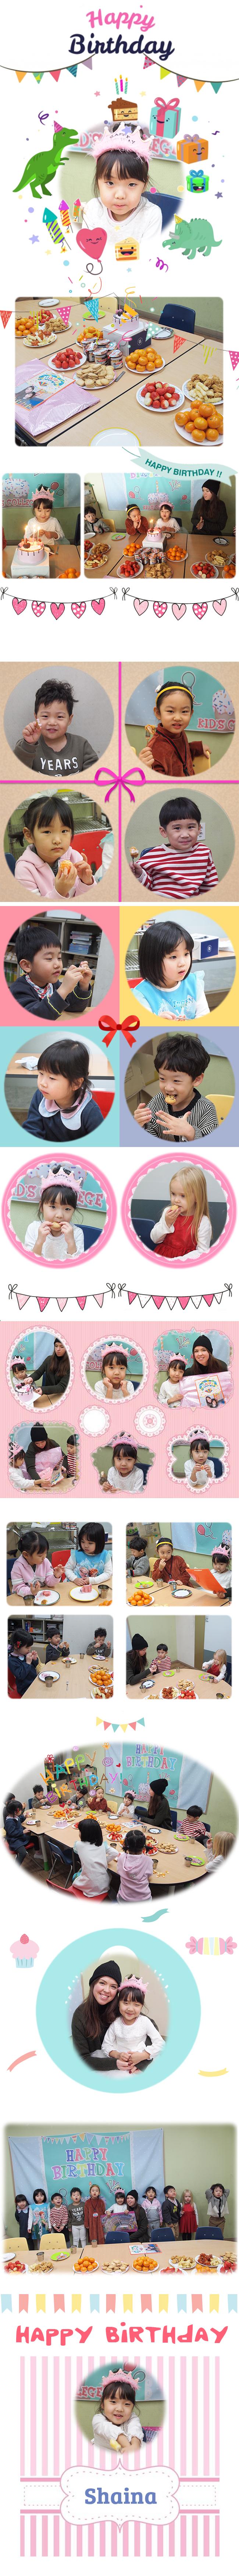 Birthday_Shaina.jpg